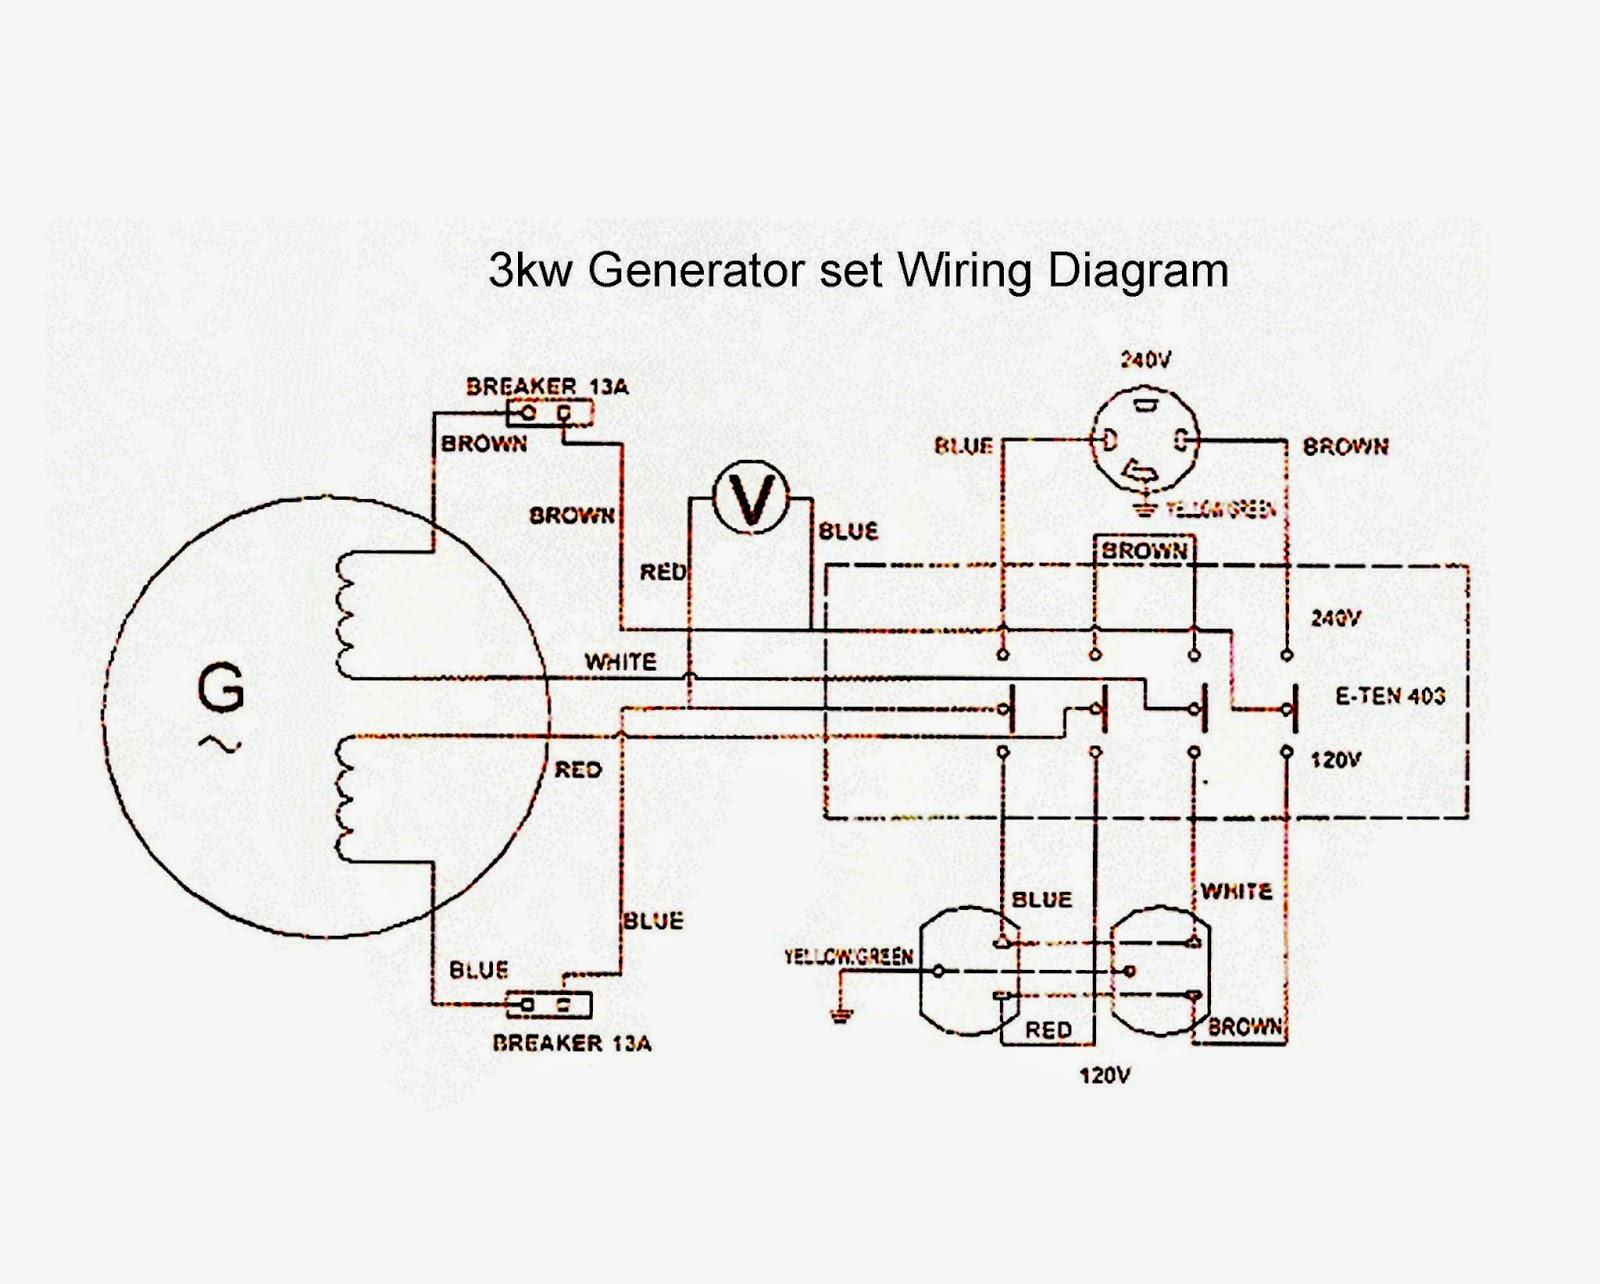 Electrical Winding - Wiring Diagrams